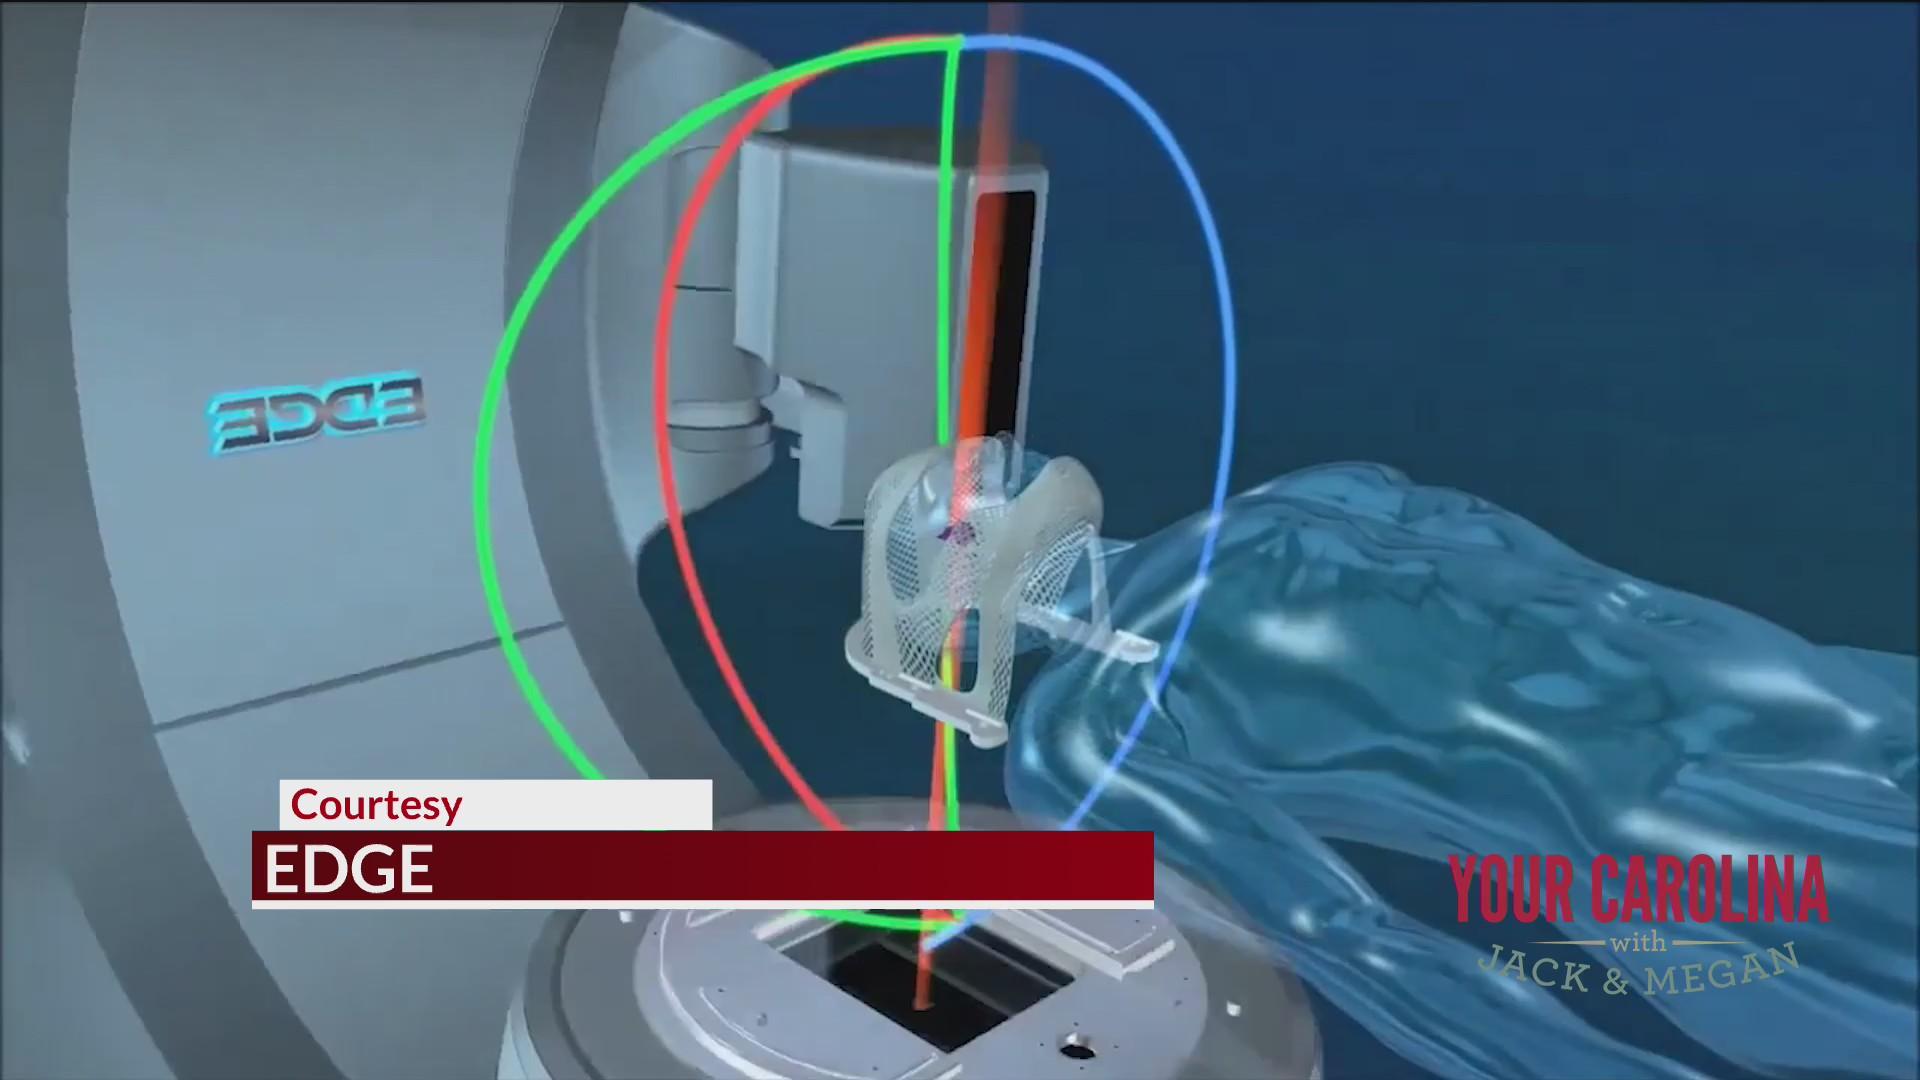 Cancer Advanced Technology